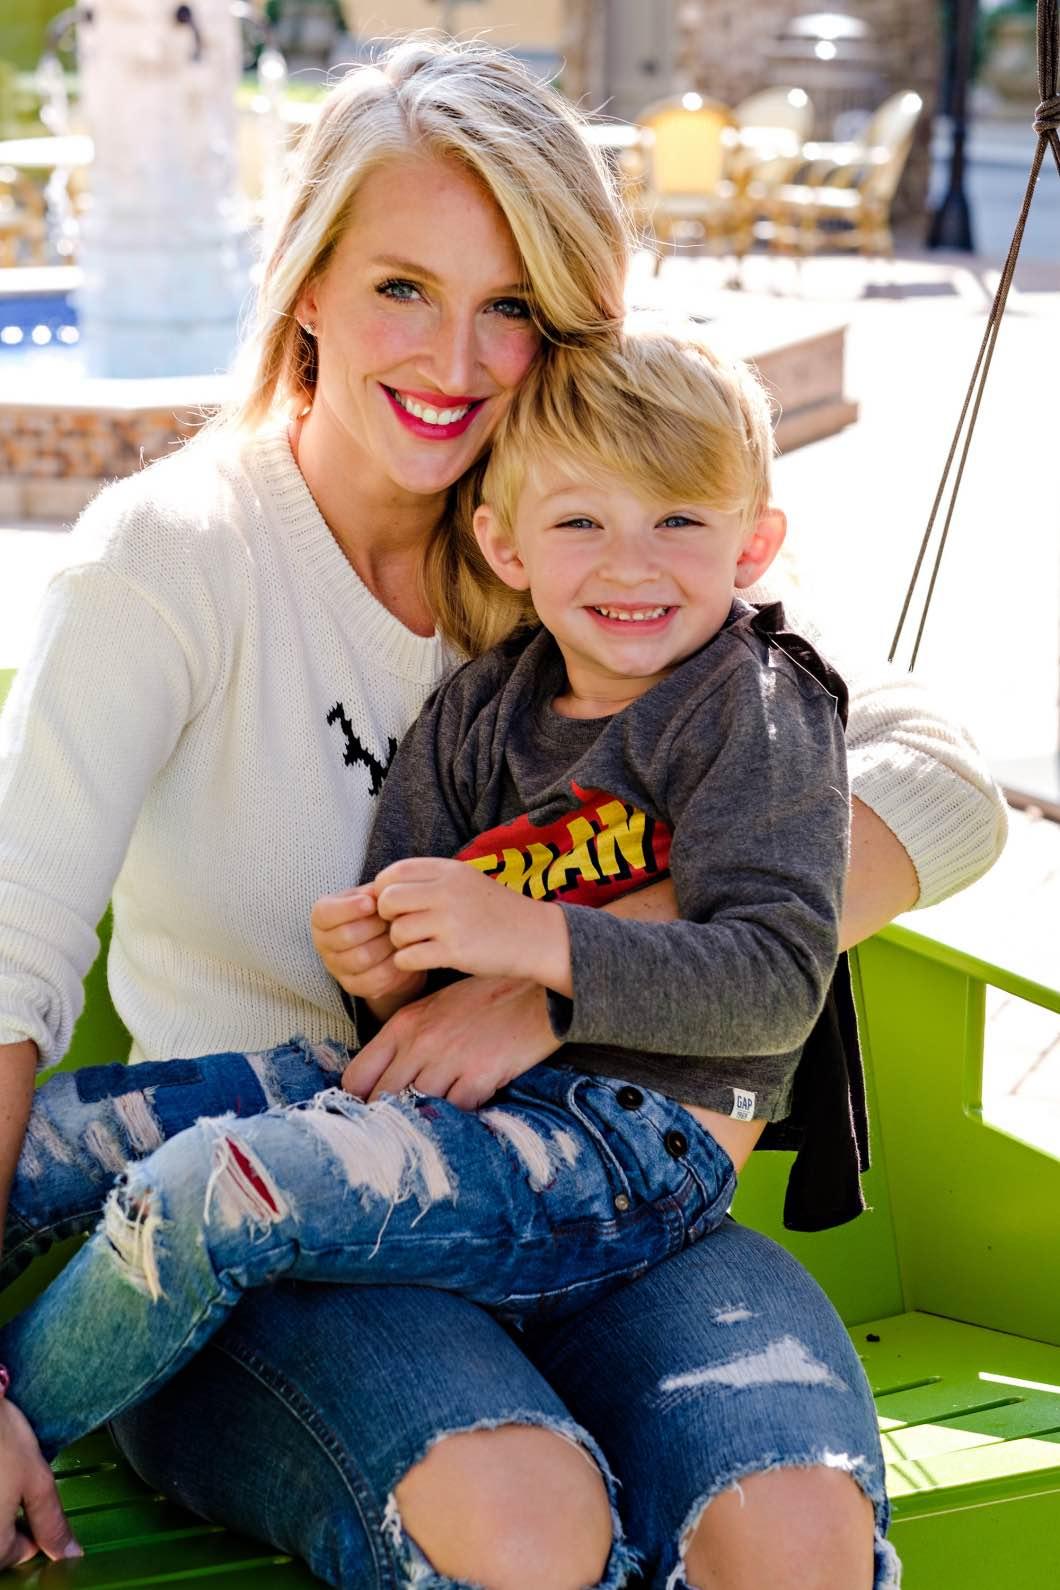 Why Life Insurance is SO Important by Atlanta mom blogger Happily Hughes